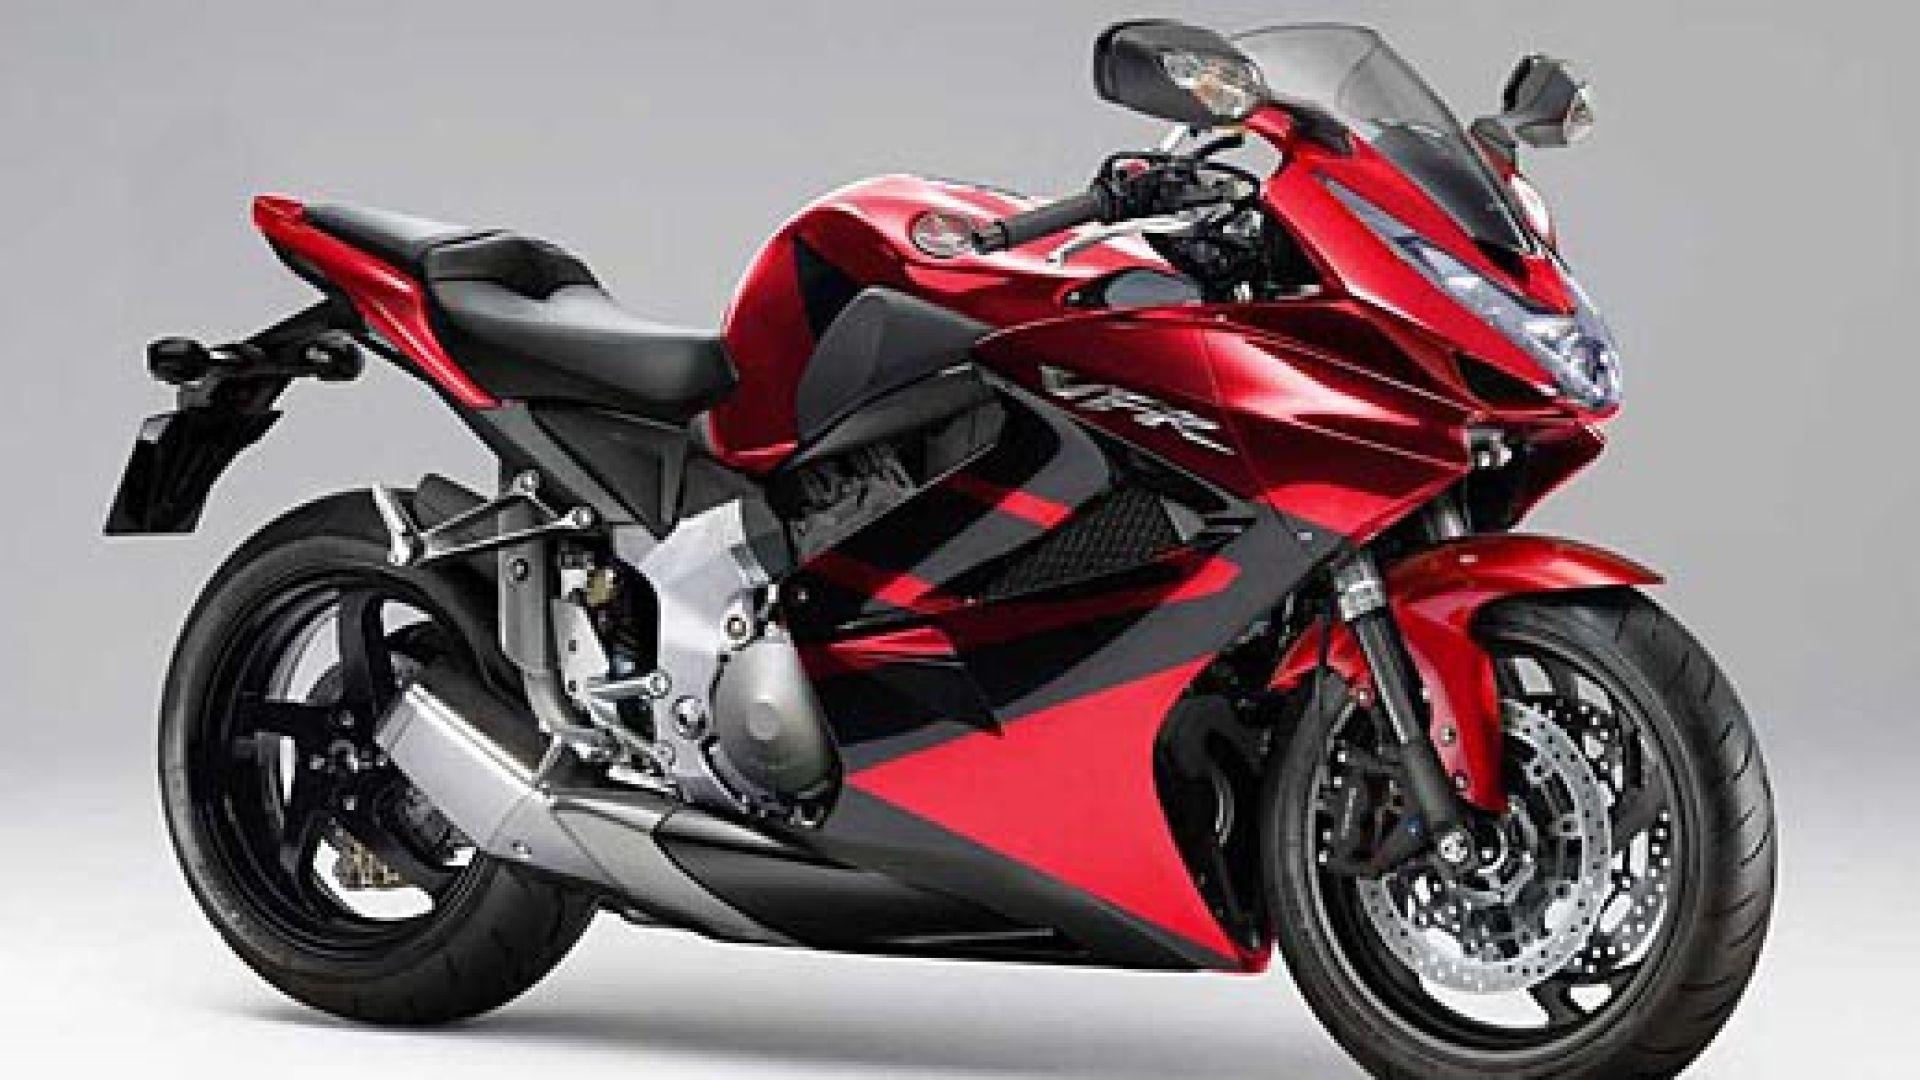 Anteprima honda vfr 1000 f e gt motorbox - Image moto sportive ...